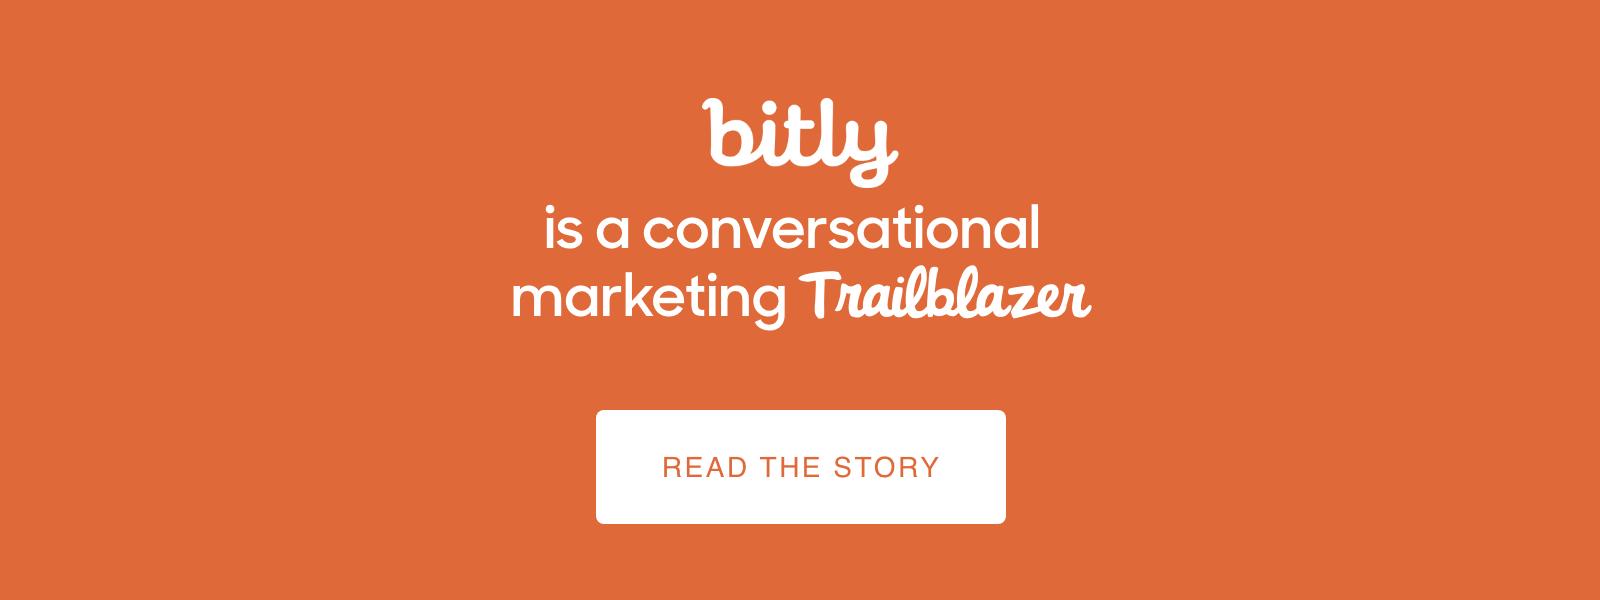 Bitly is a conversational marketing trailblazer